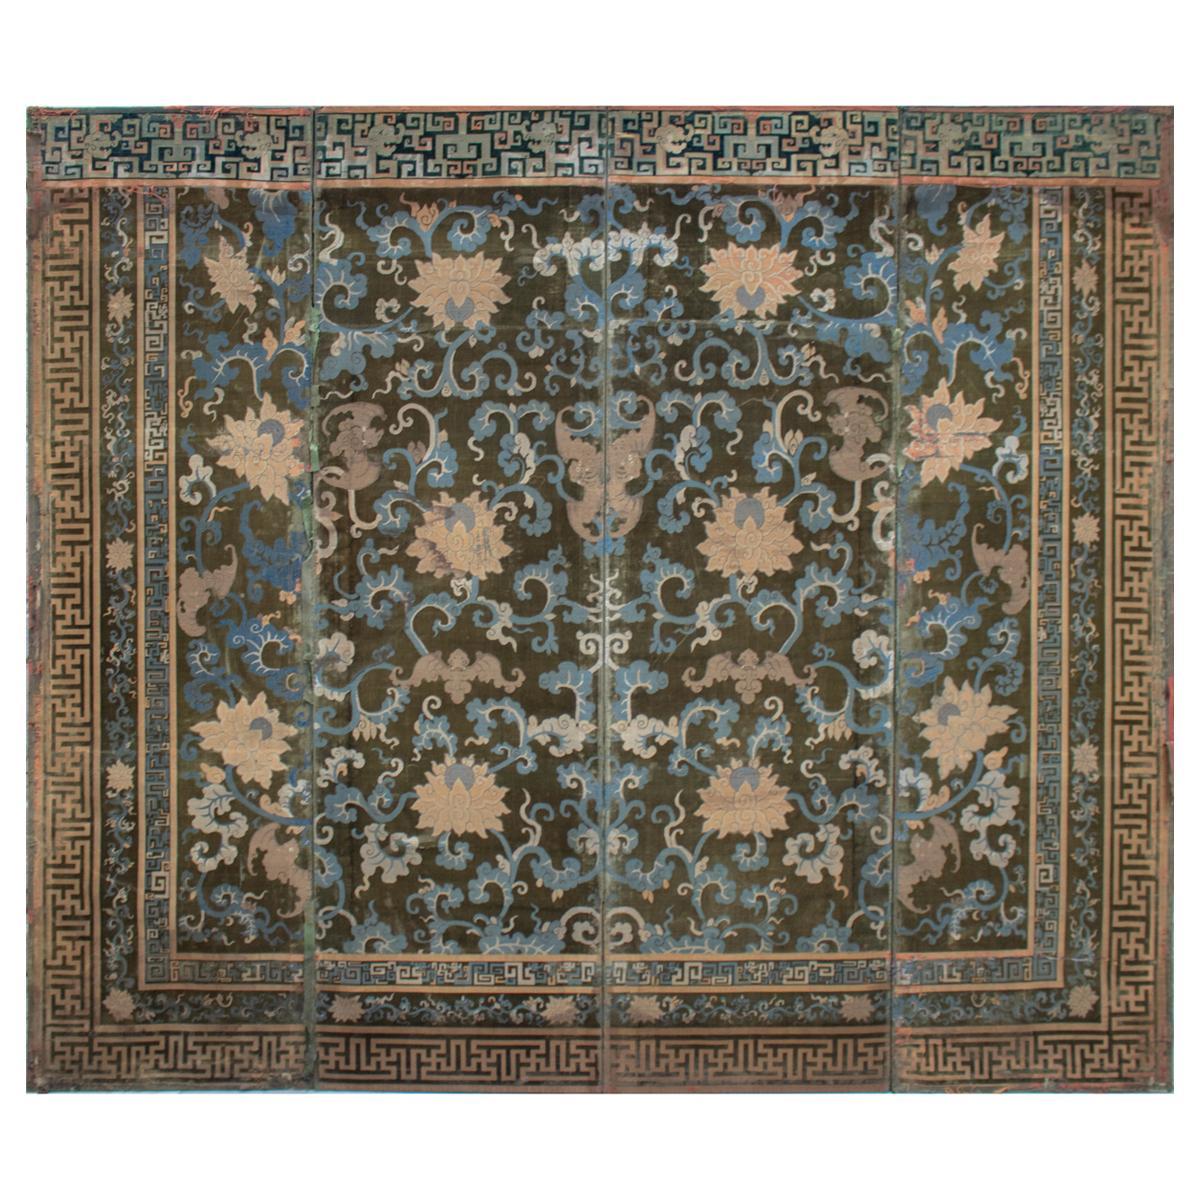 18th Century Chinese Voided Silk Velvet Folding Screen from England